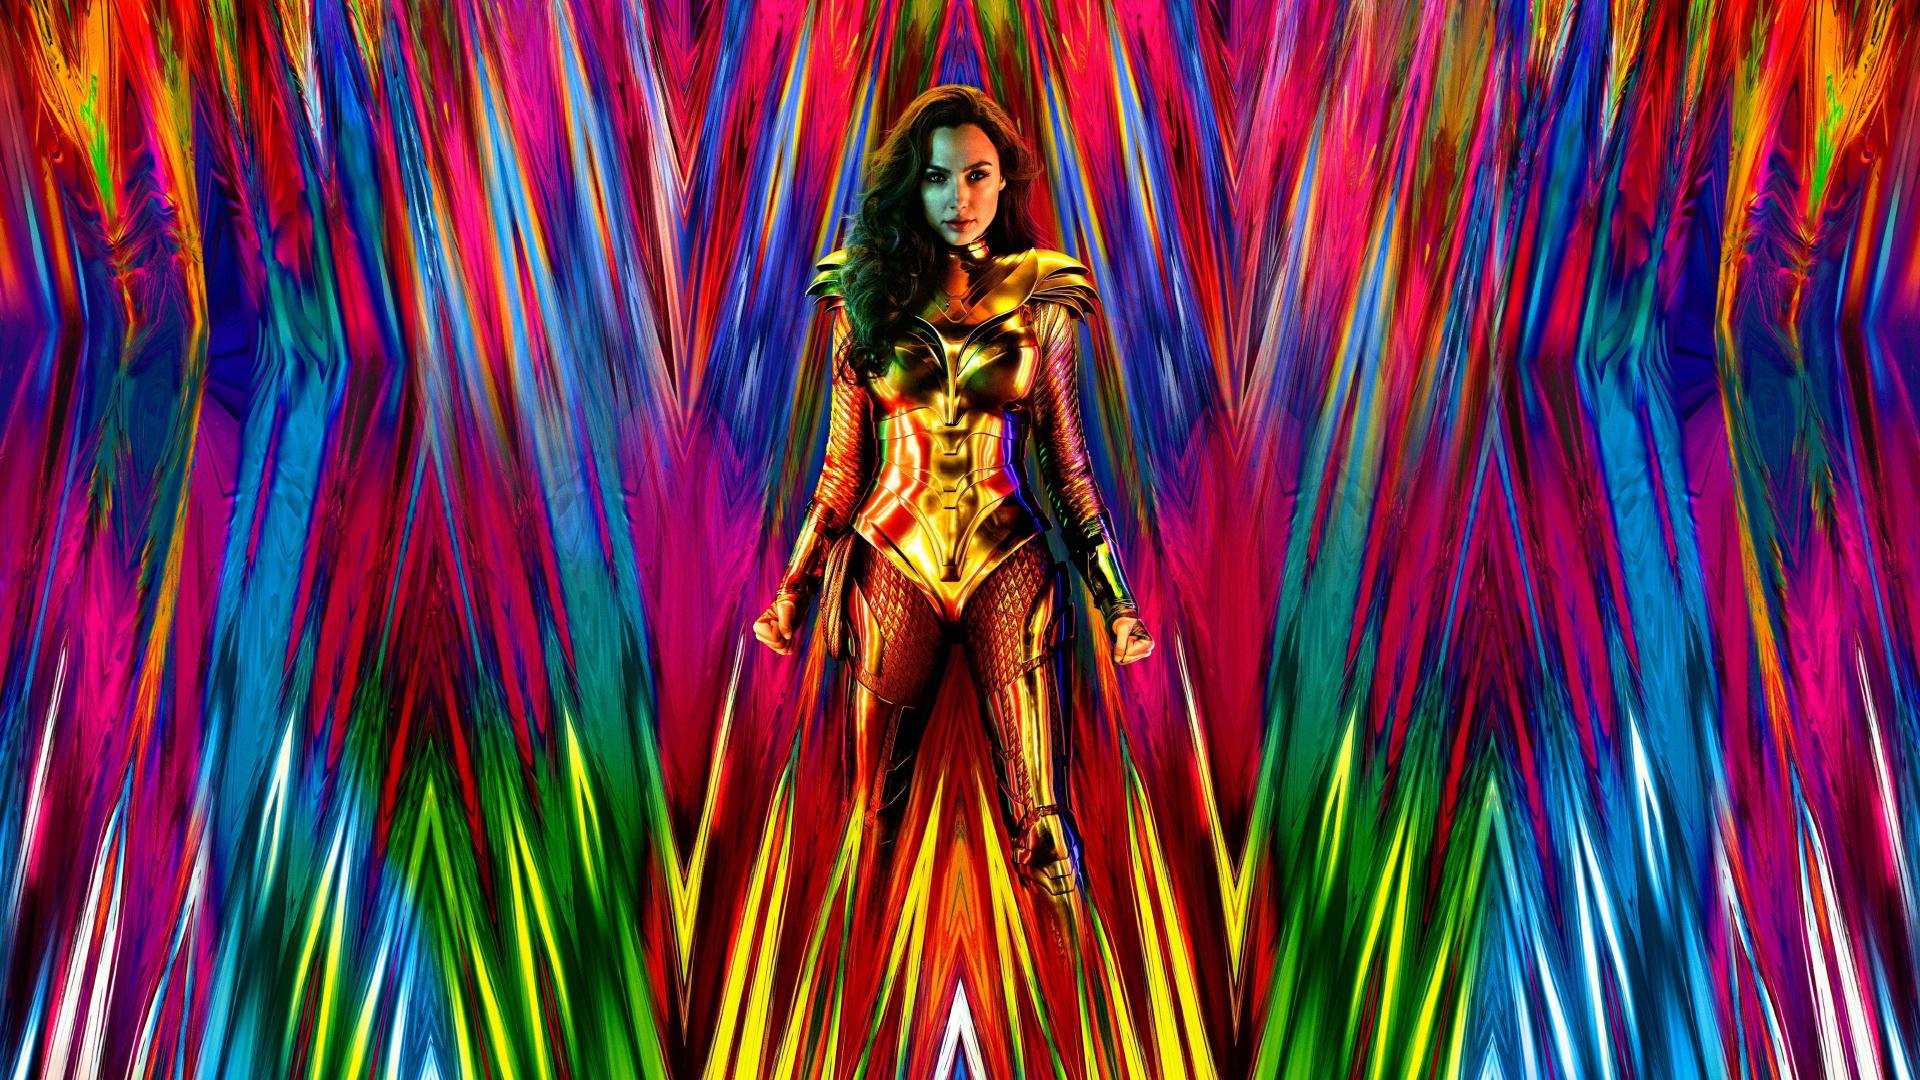 Wonder Woman 1984 Movie 2020 Wallpaper Photo MeWallpaper 1920x1080